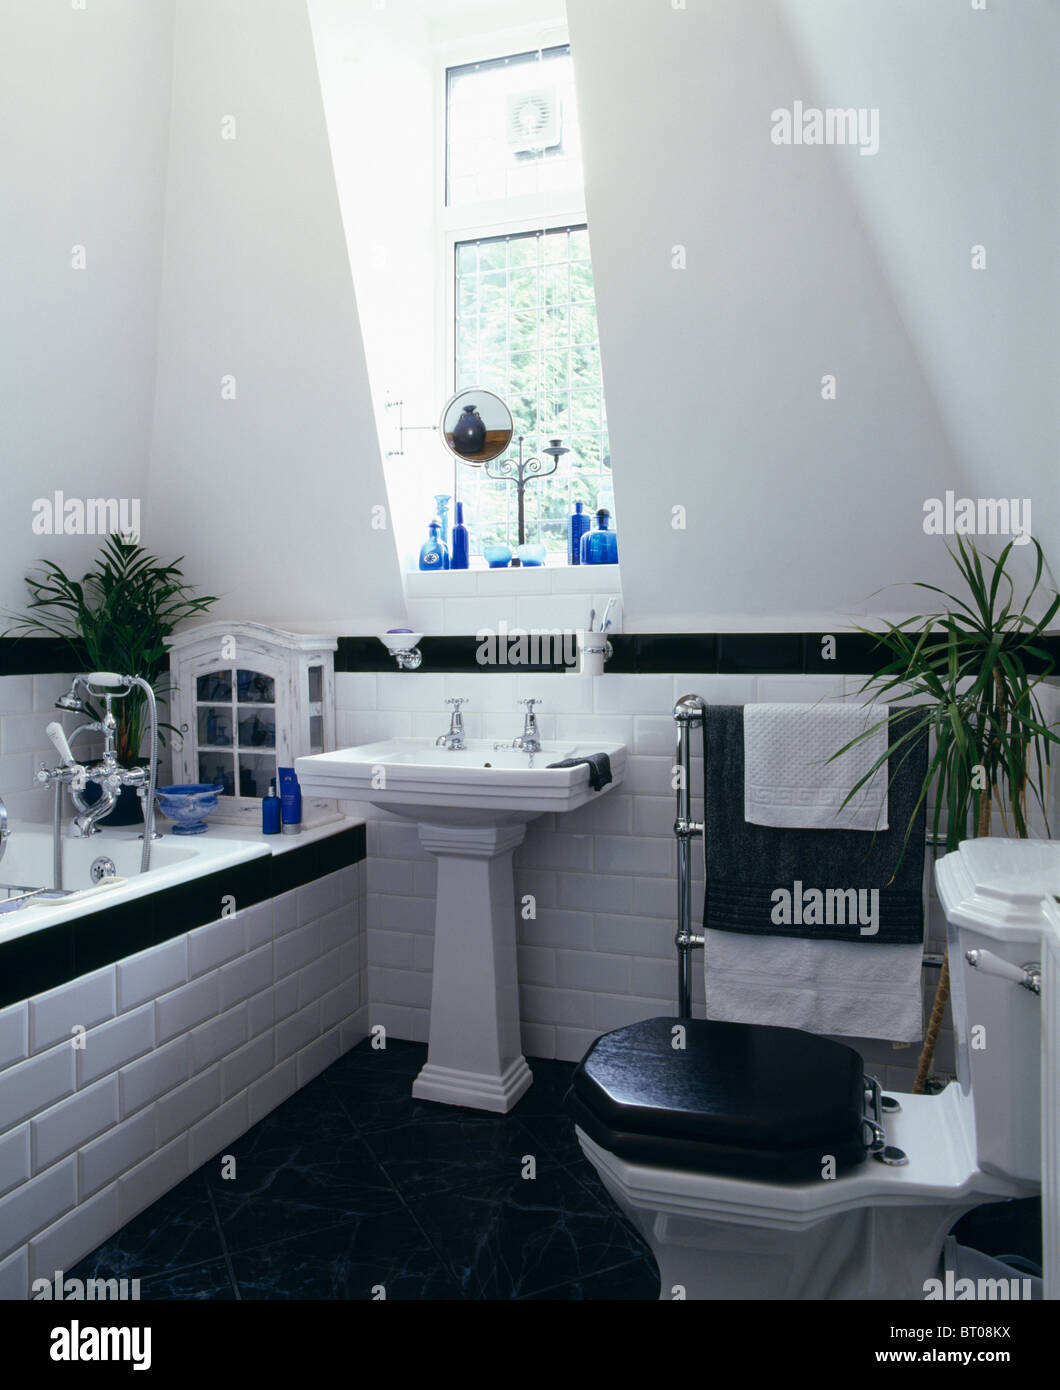 wei en sockel becken unter fenster in schwarz wei dachgeschoss badezimmer mit schwarzem sitz. Black Bedroom Furniture Sets. Home Design Ideas